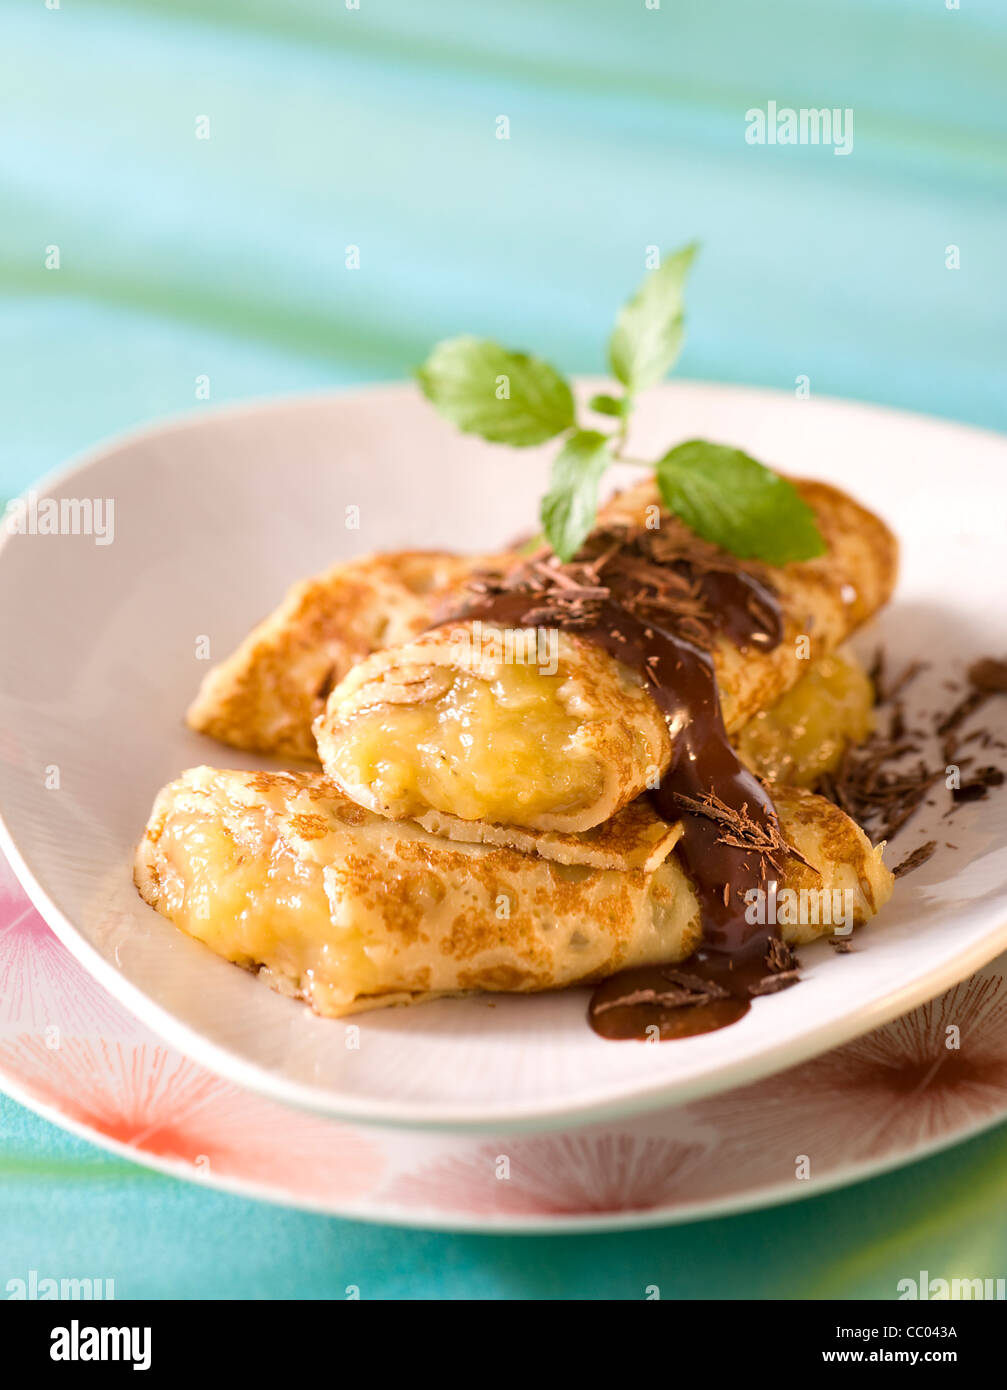 Banana Jam Pancakes - Stock Image